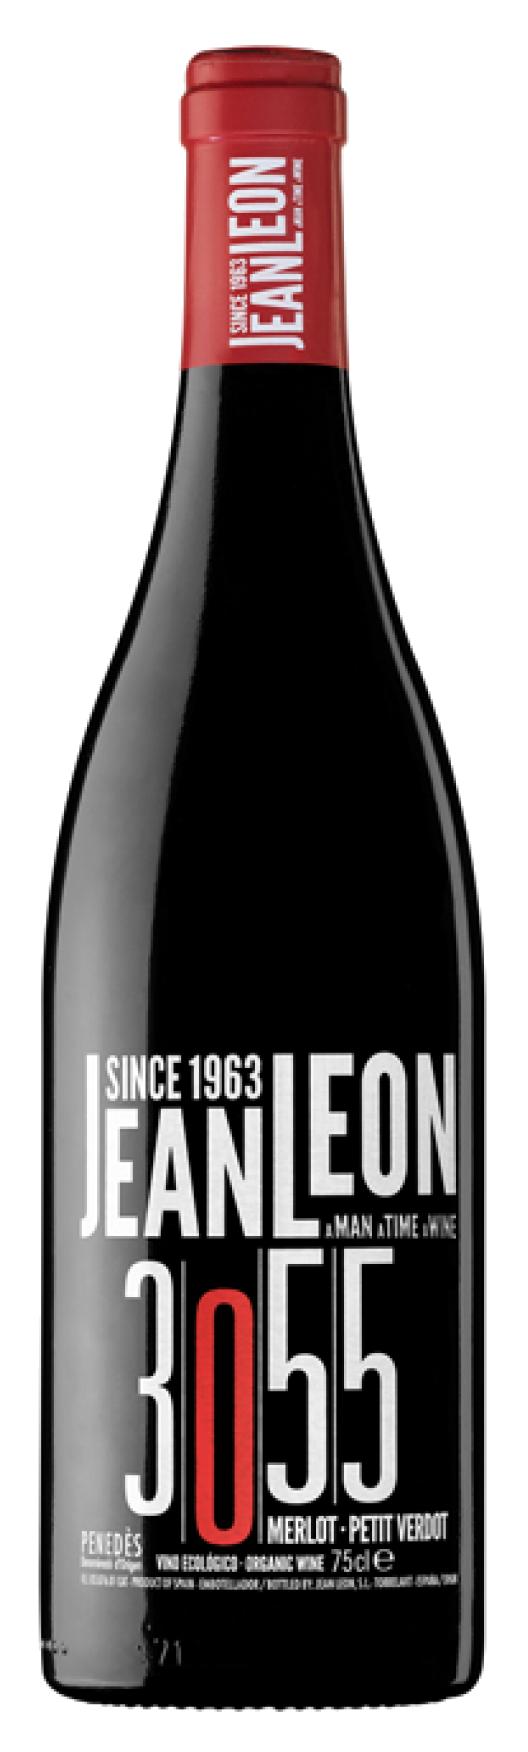 Jean Leon Merlot Petit Verdot 2013